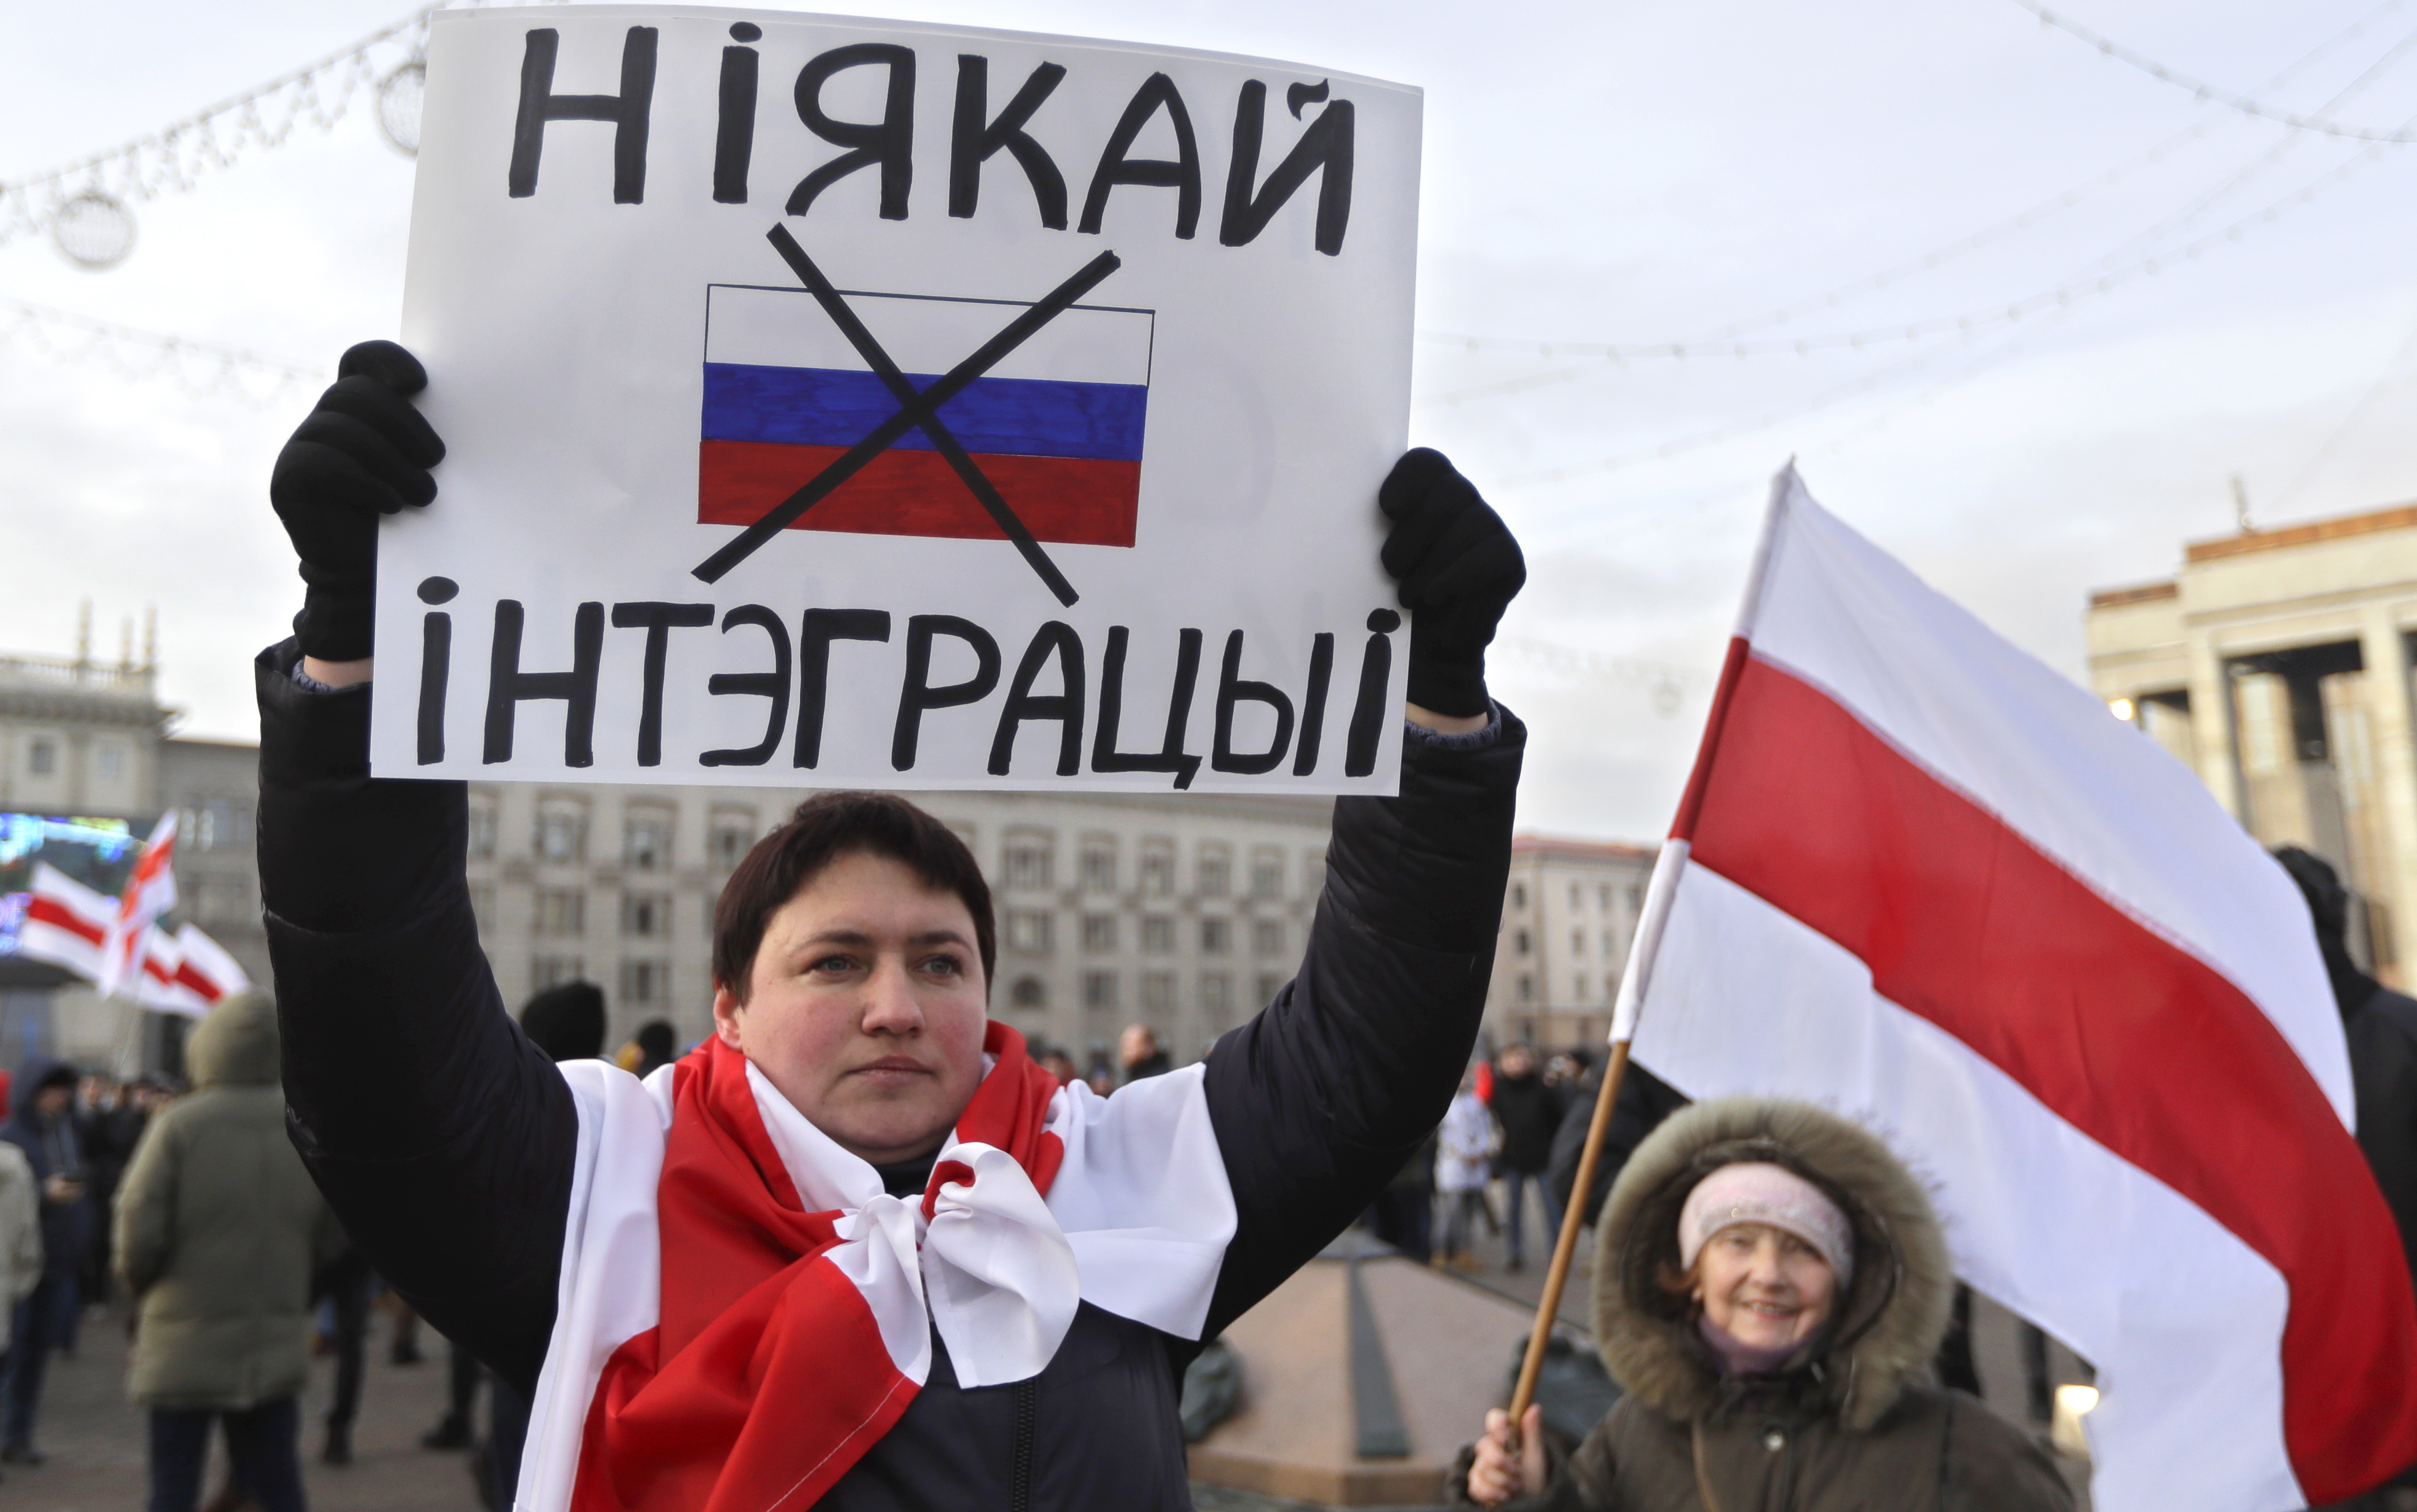 Protests Erupt as Russia Seeks Closer Ties With Belarus